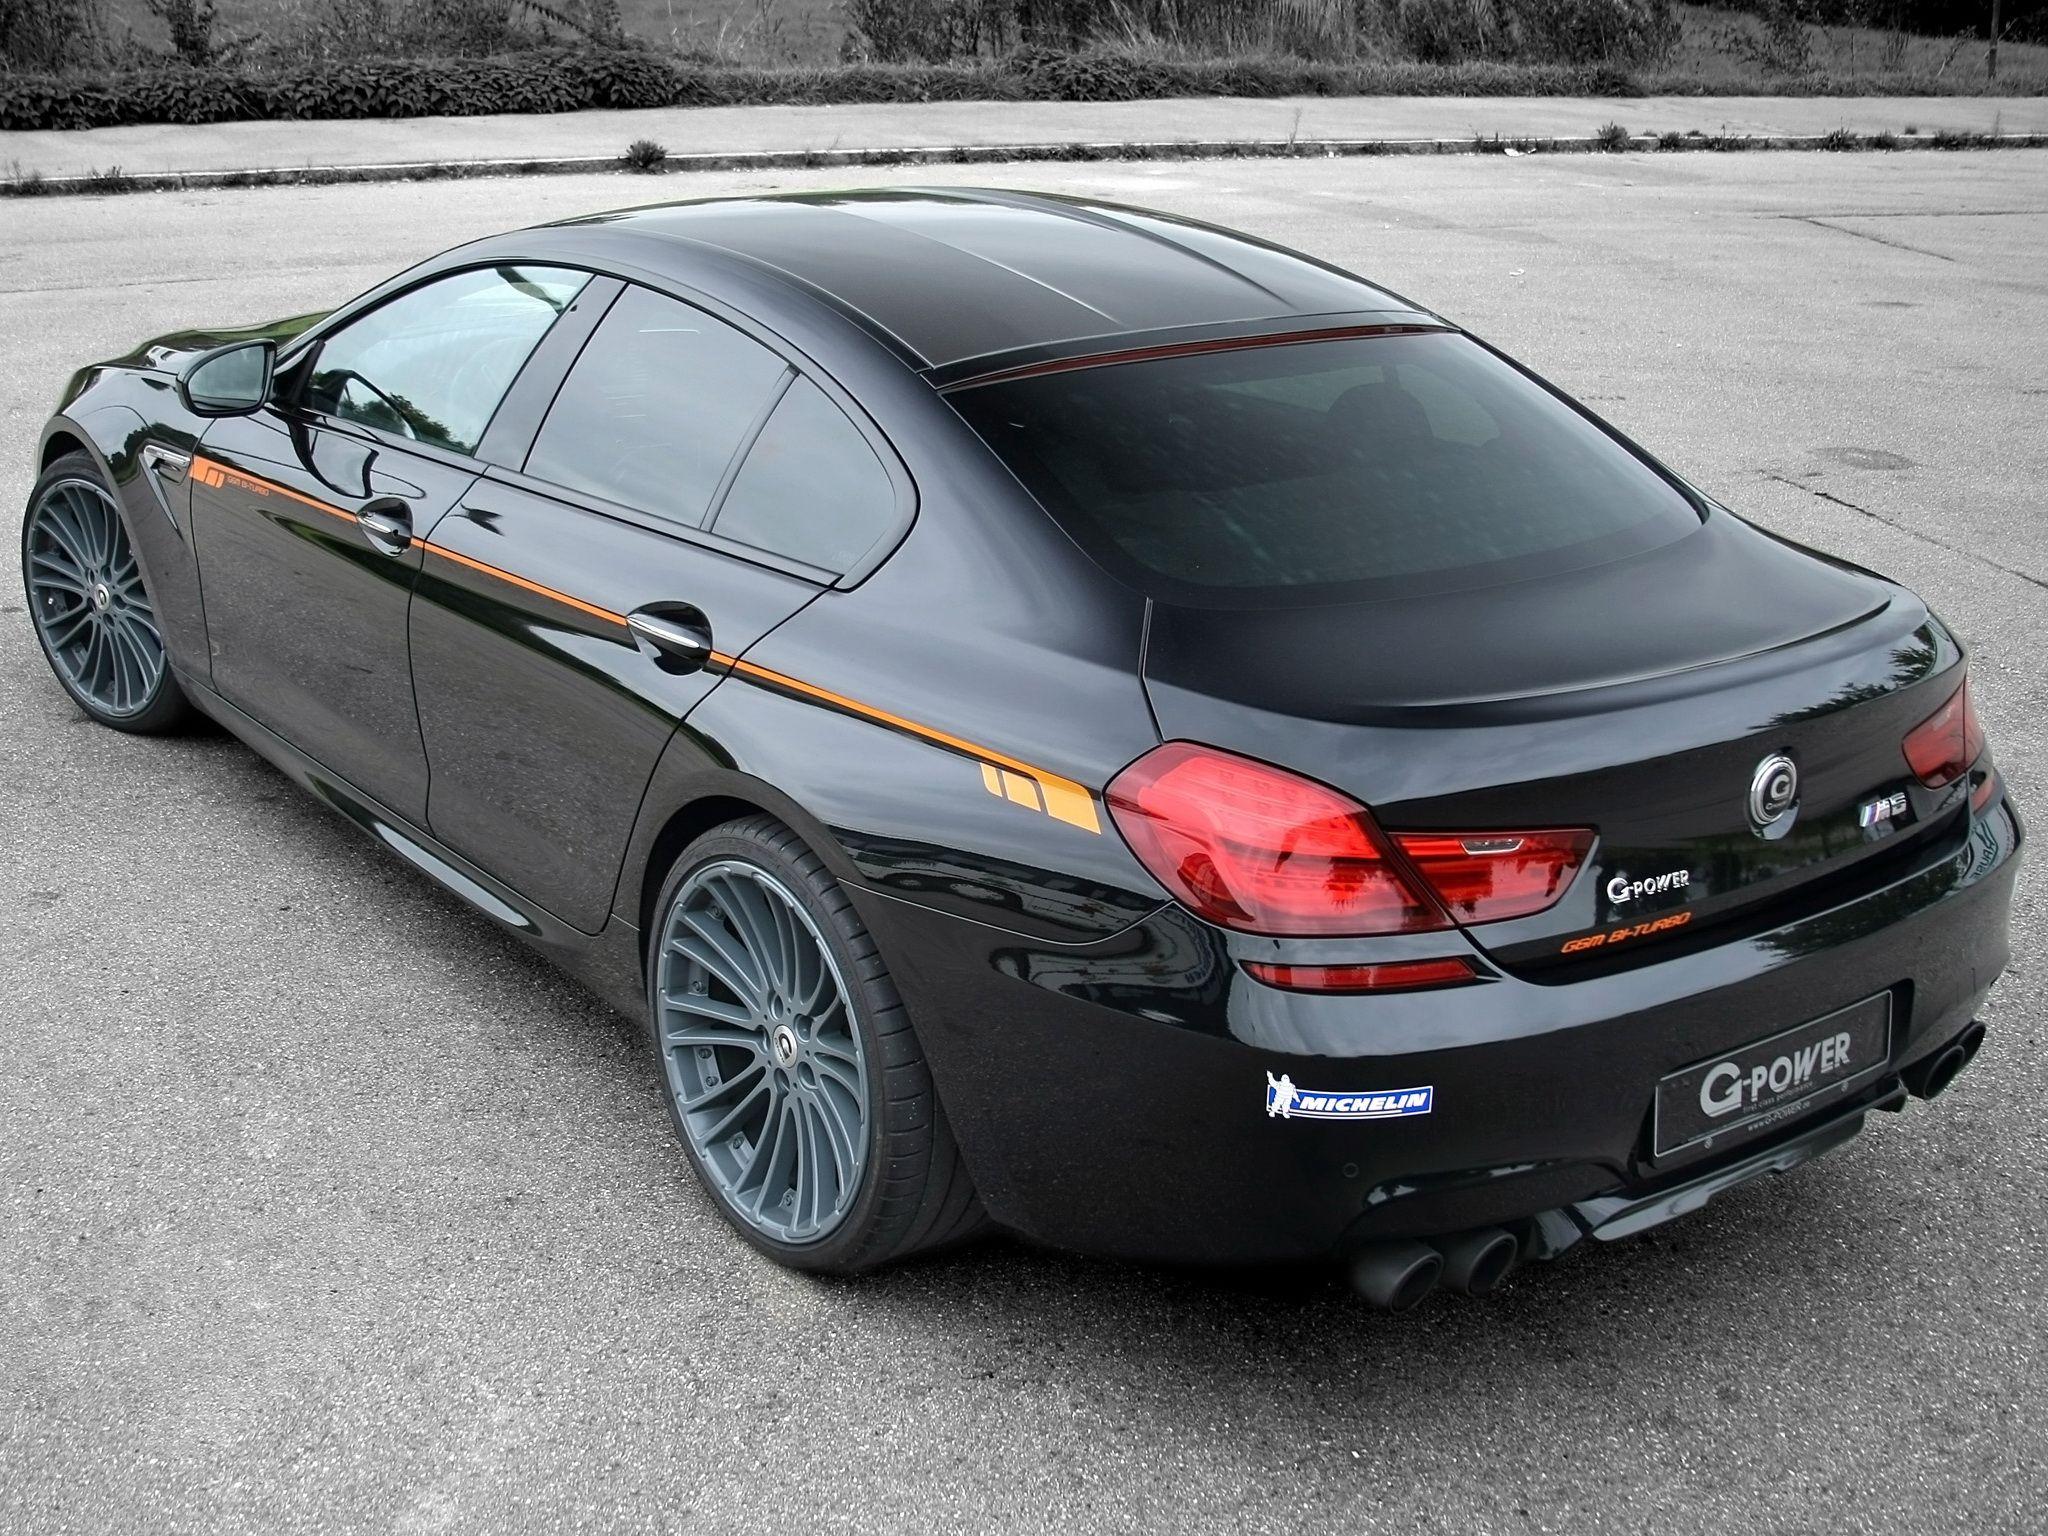 bmw 2014 black m6. 2013 gpower bmw m6 gran coupe f06 tuning g bmw 2014 black